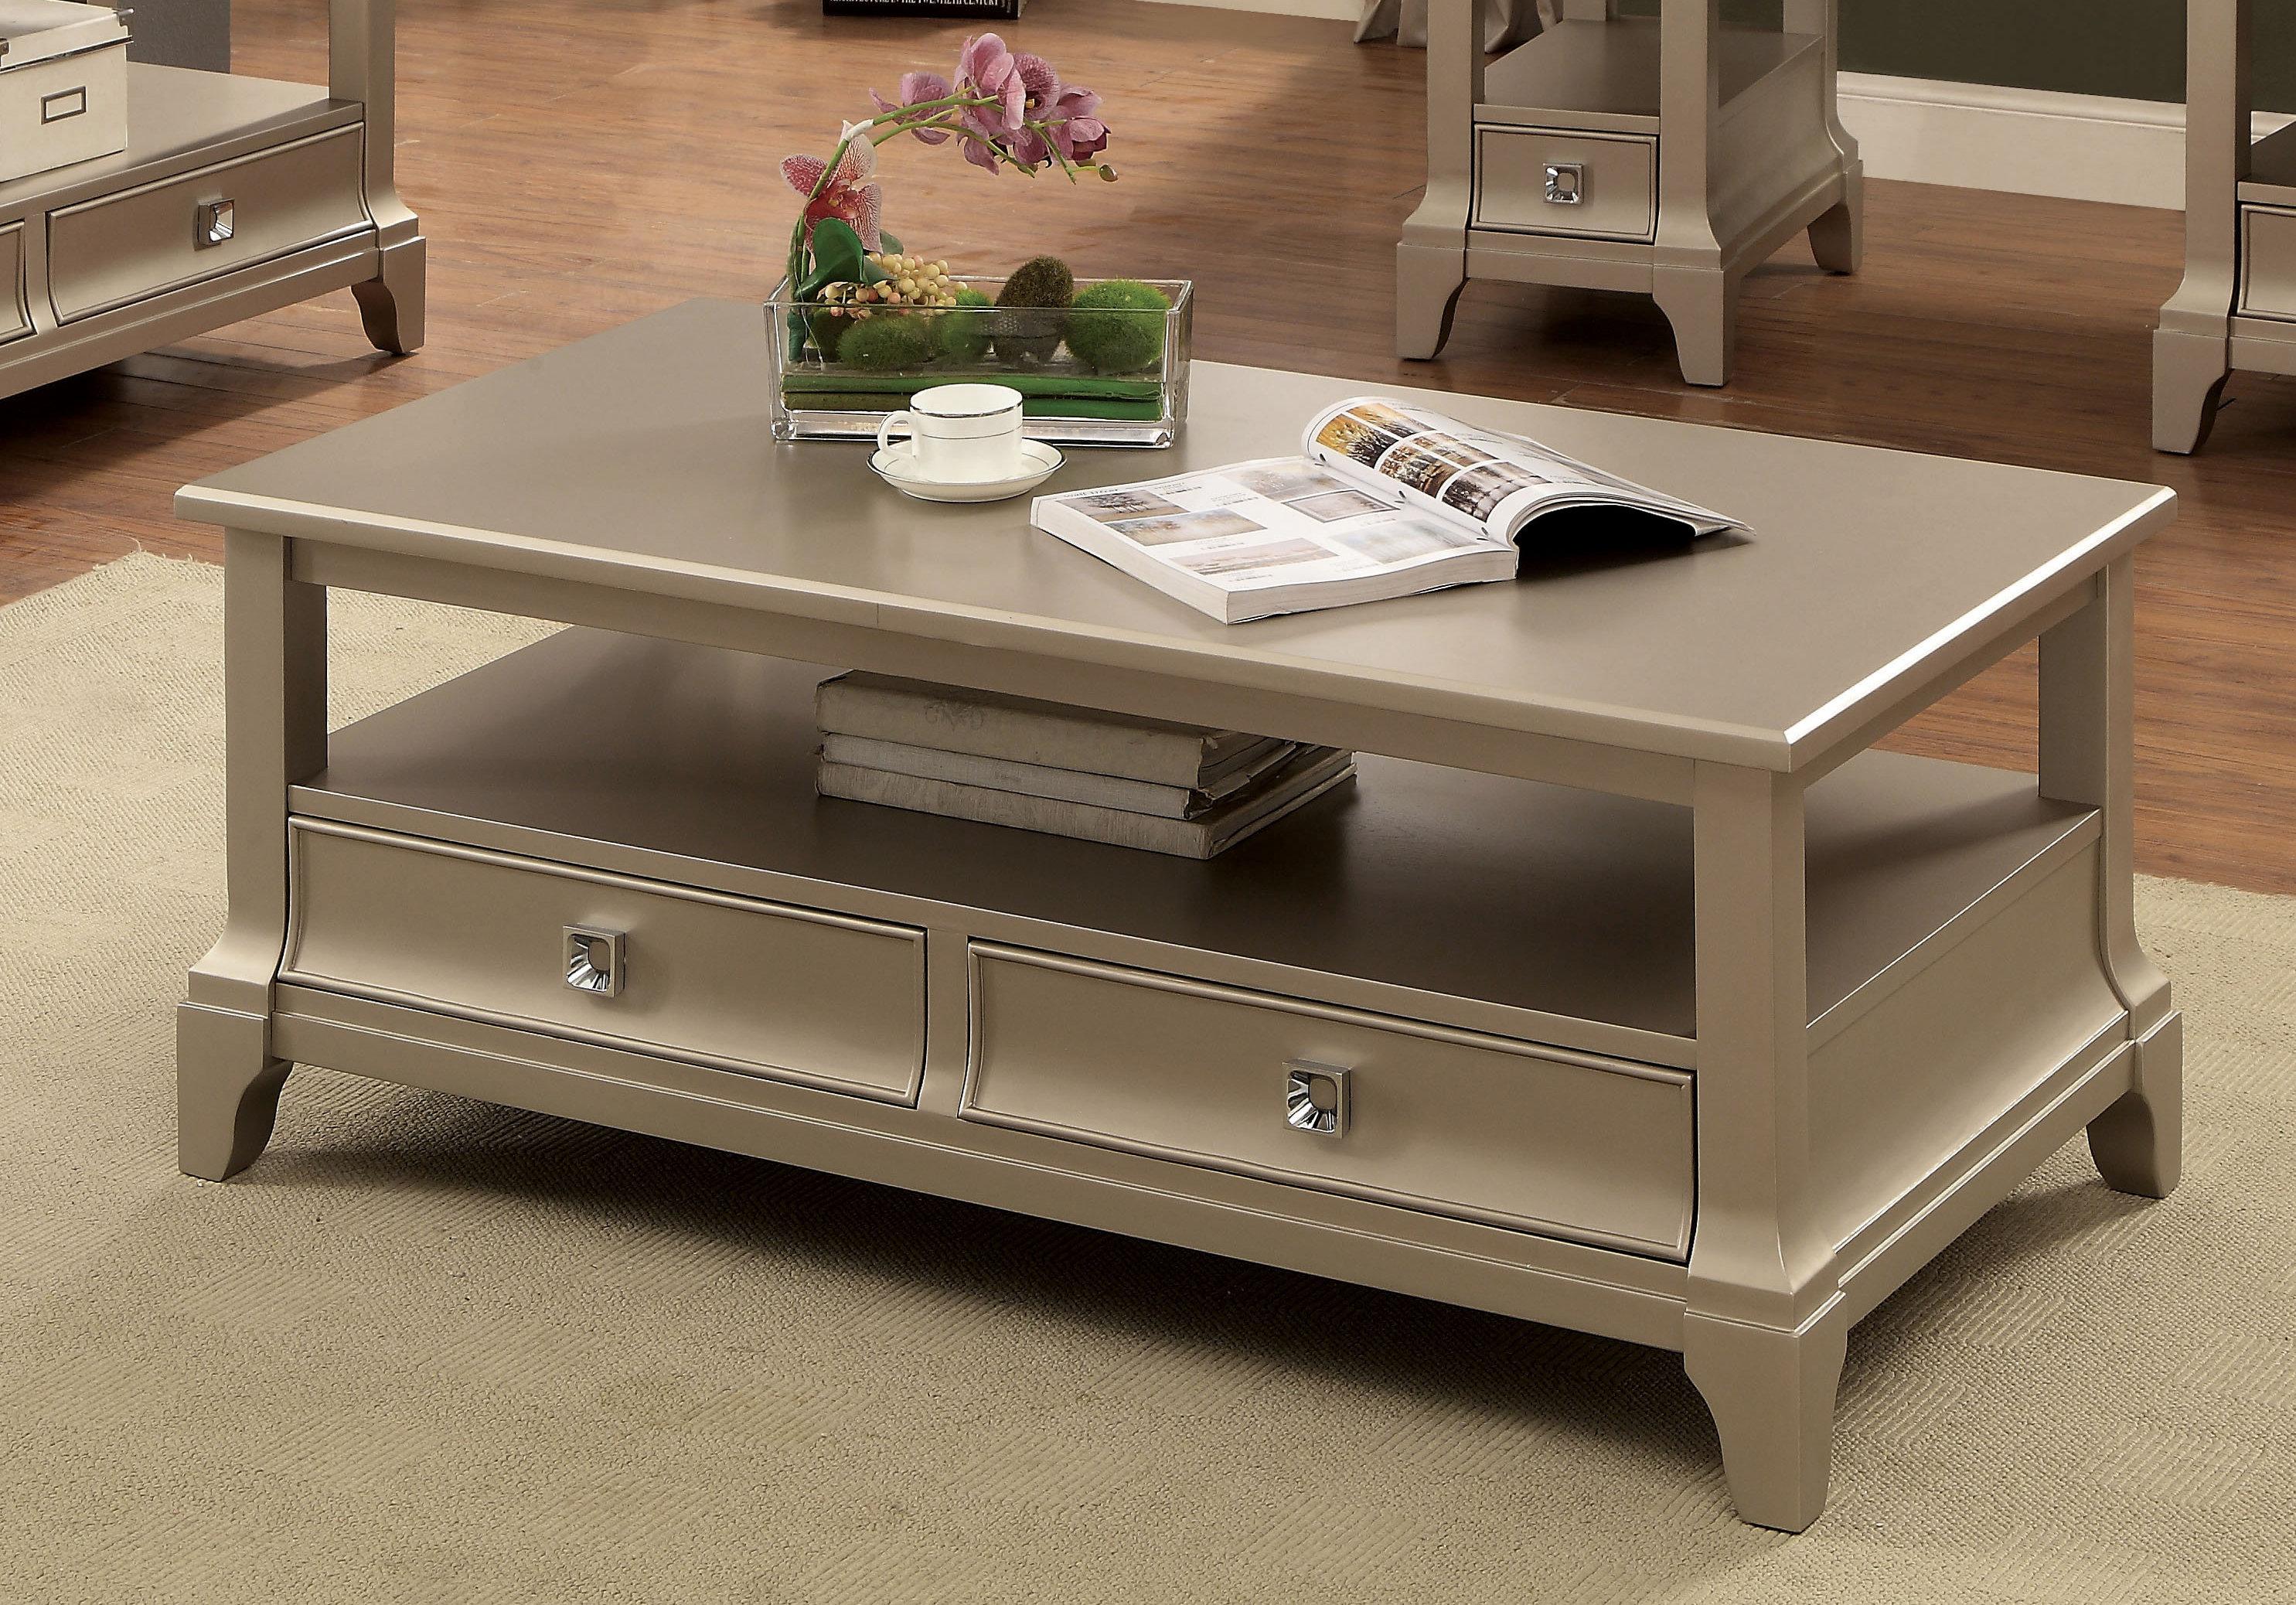 contemporary coffee tables with storage house of hampton mcelfresh contemporary coffee table with storage | wayfair OSHGORZ